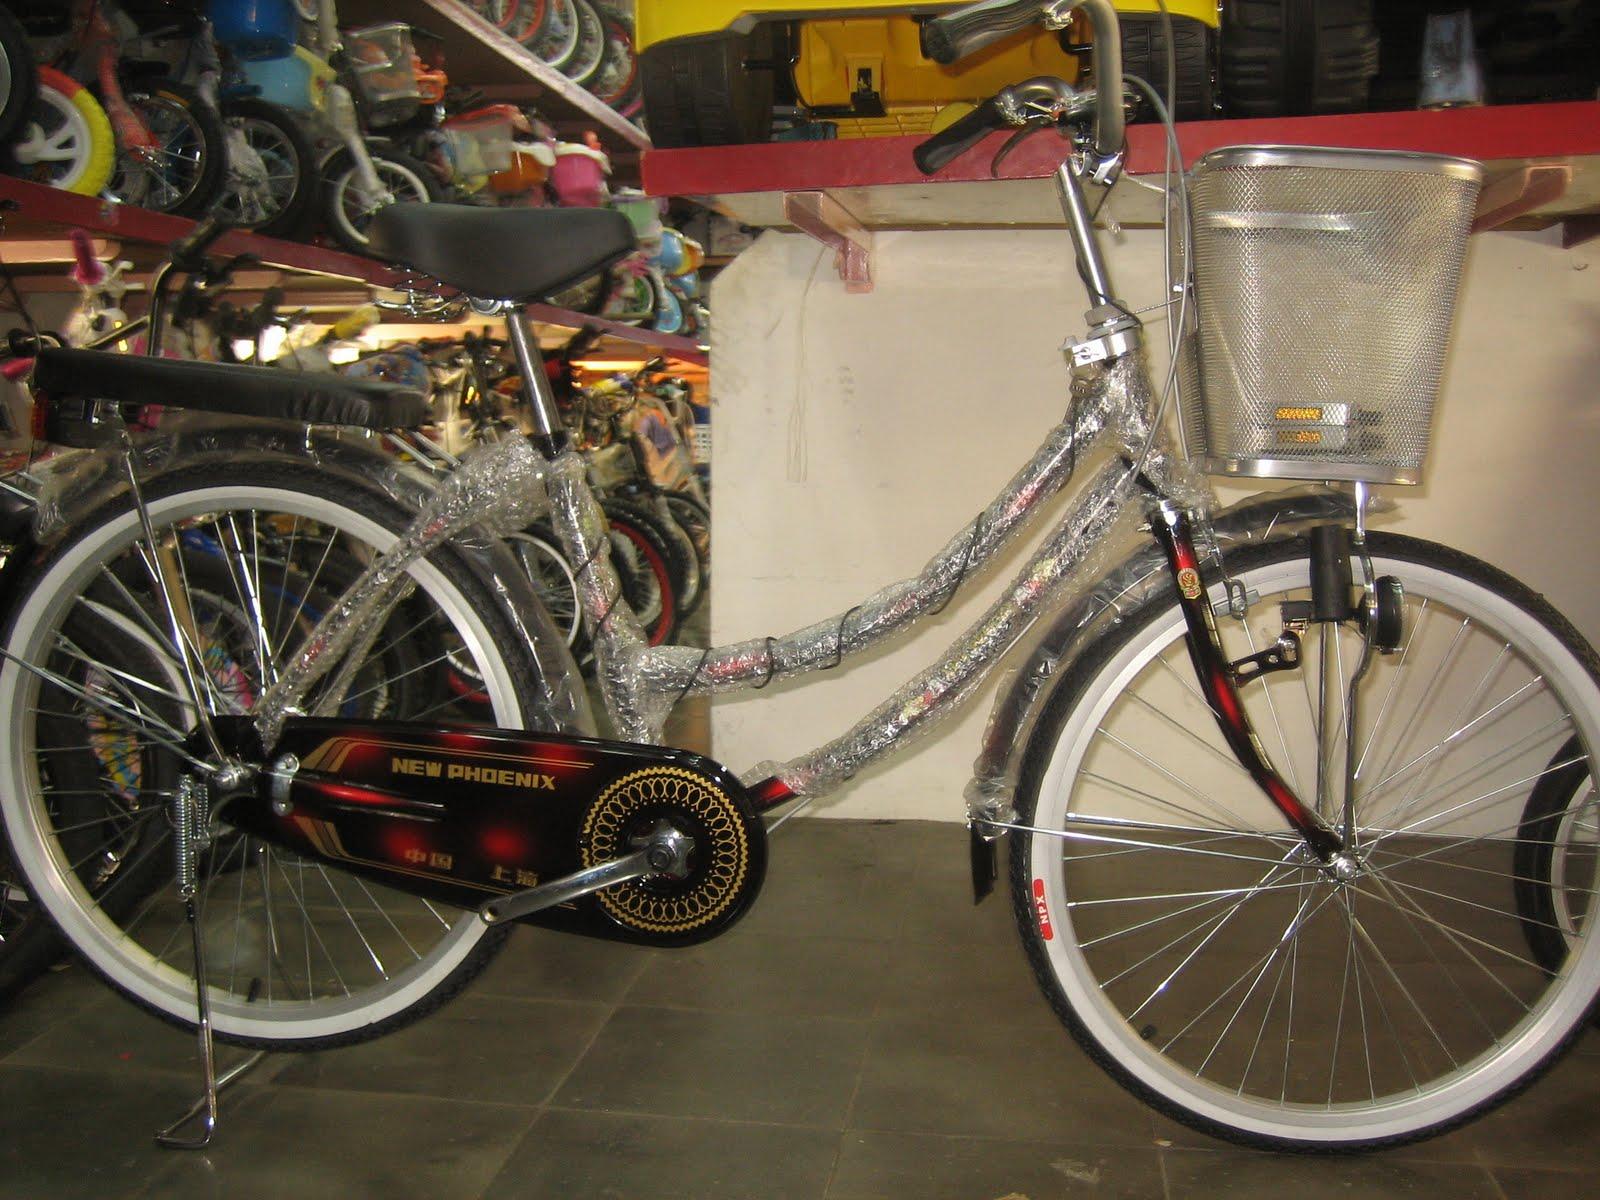 tokomagenta: A Showcase of Products: City Bike PHOENIX